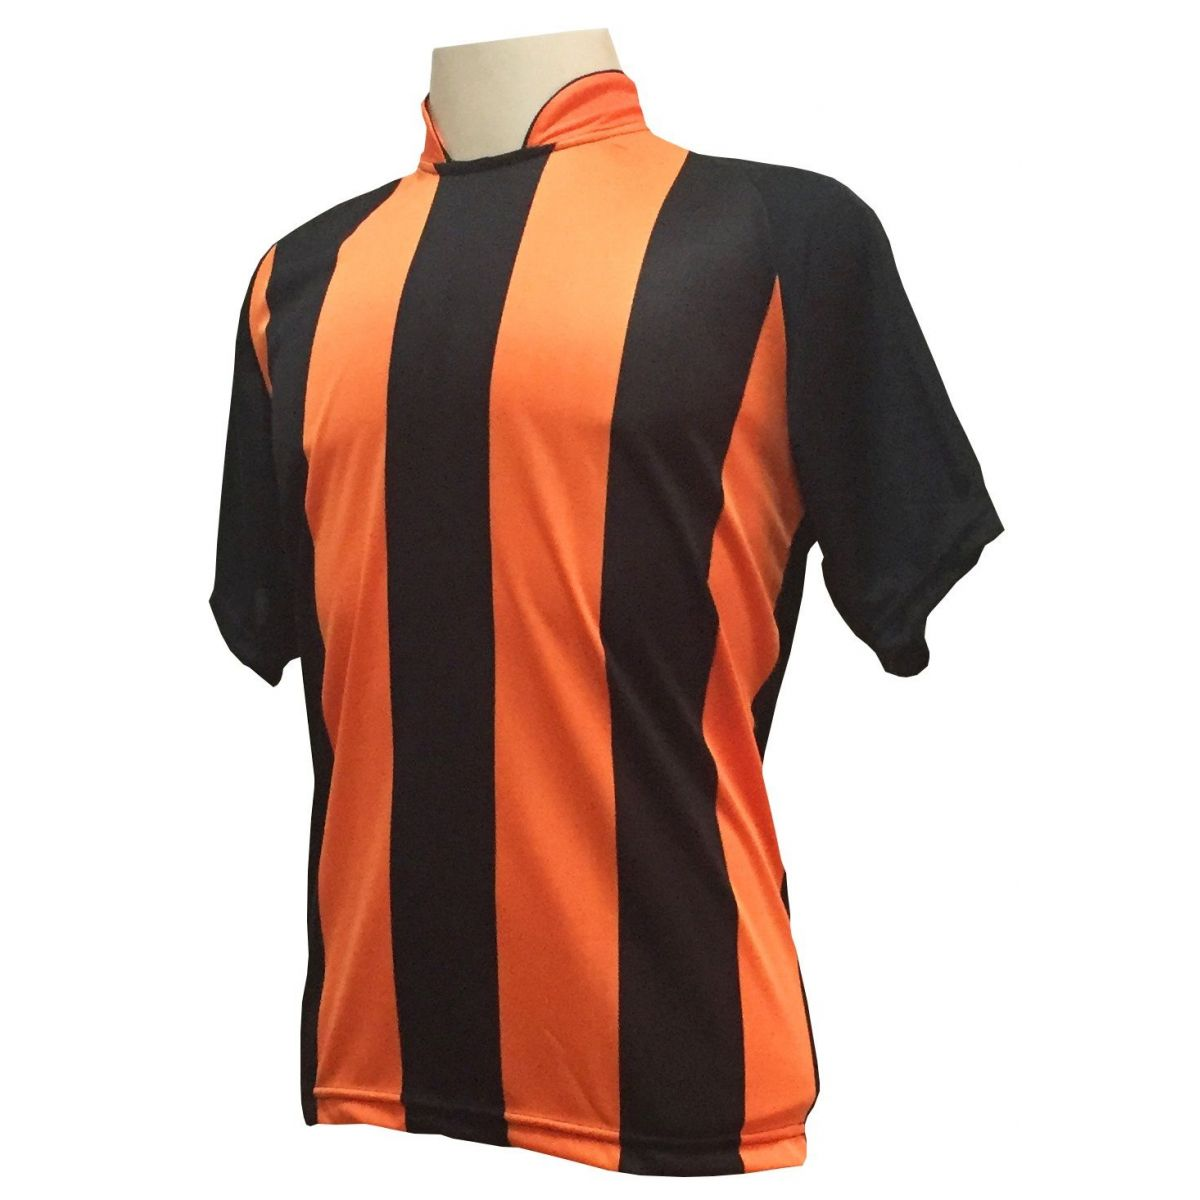 Jogo de Camisa com 18 unidades modelo Milan Preto/Laranja